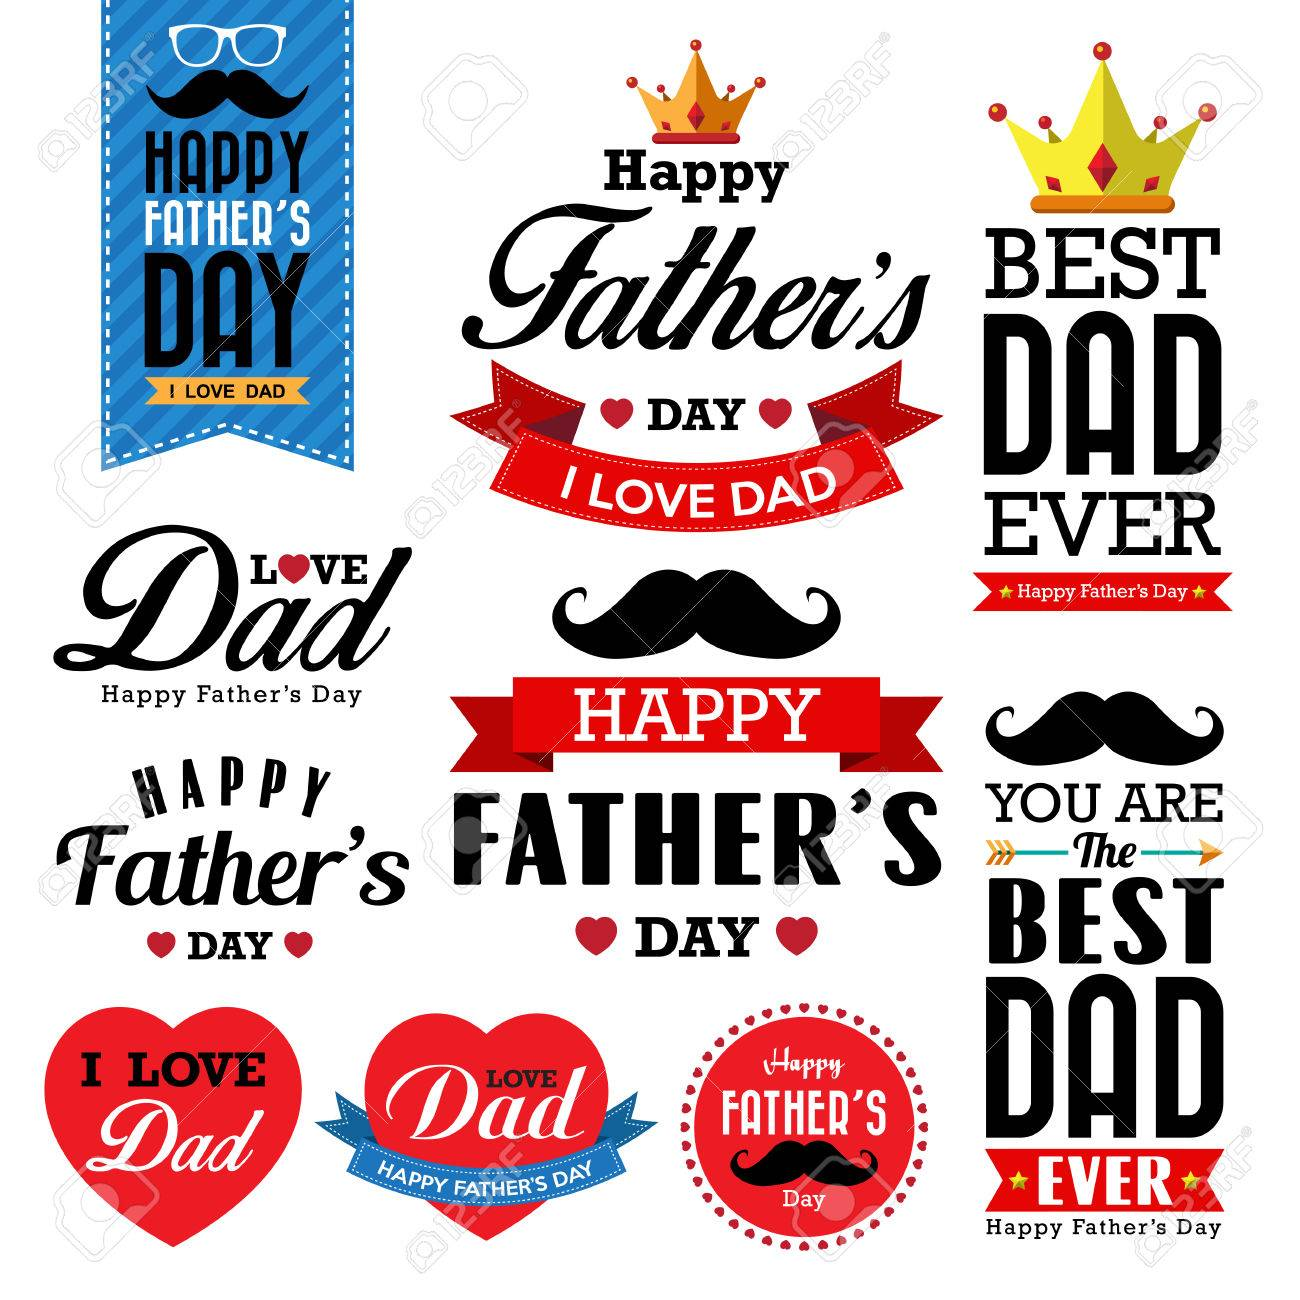 Happy fathers day vintage retro type font.Illustrator eps10 - 29127606